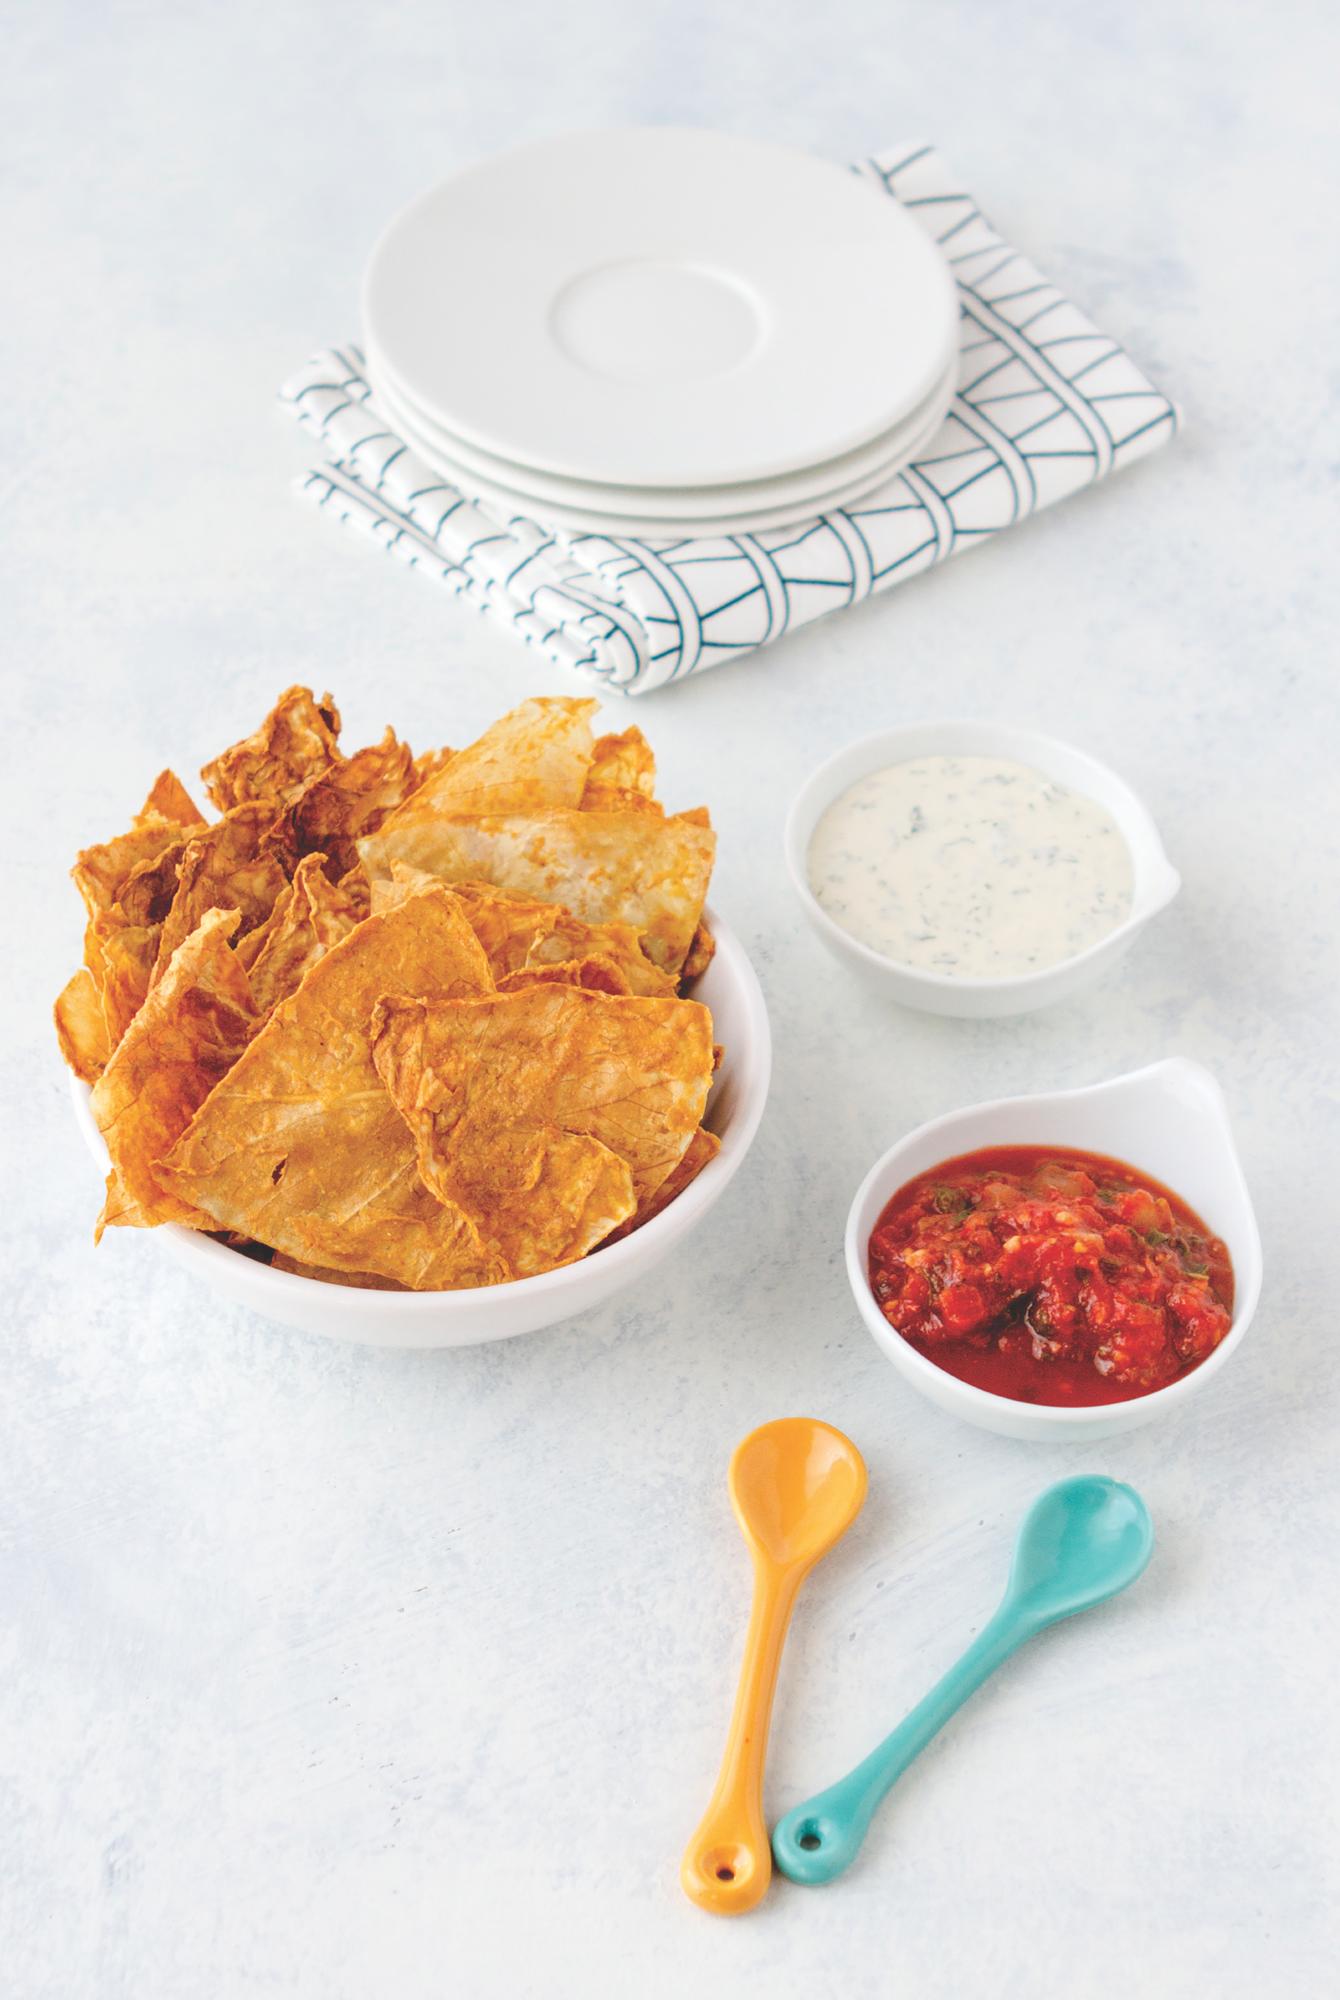 Zesty Nacho Cabbage Chips A ketofriendly approach to